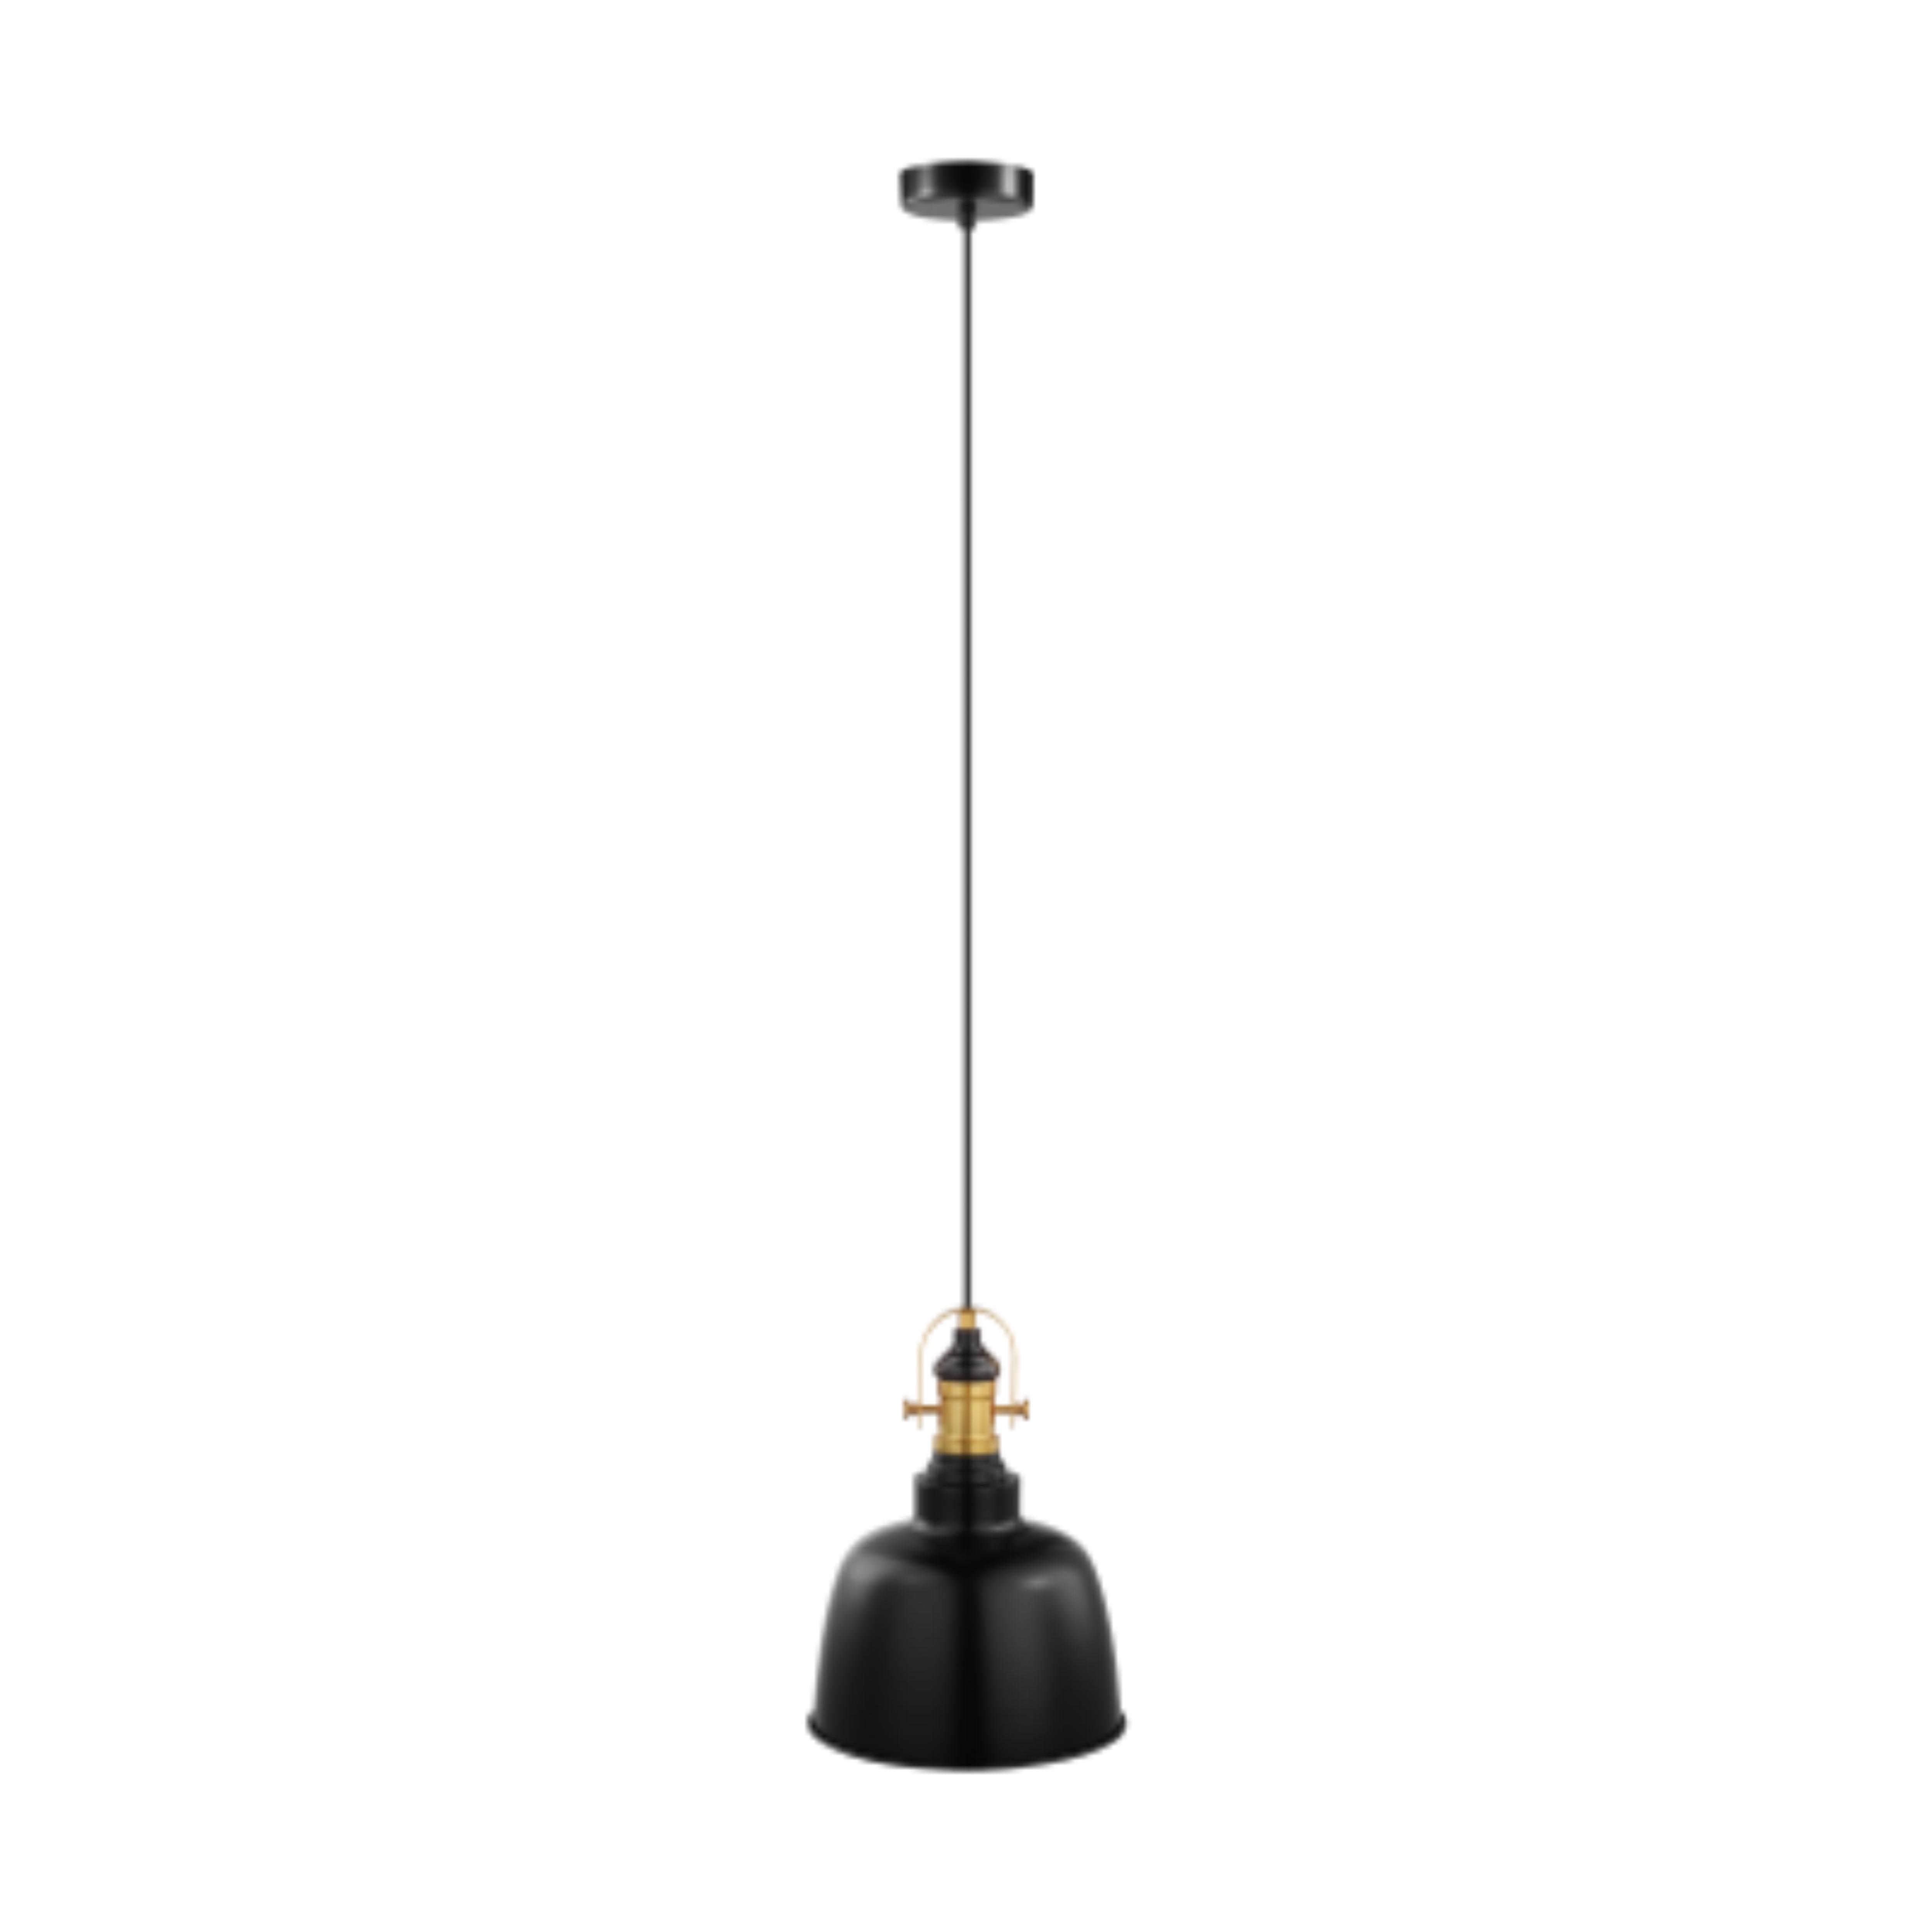 Pendul Eglo GILWELL 49839 negru-bronz, vintage